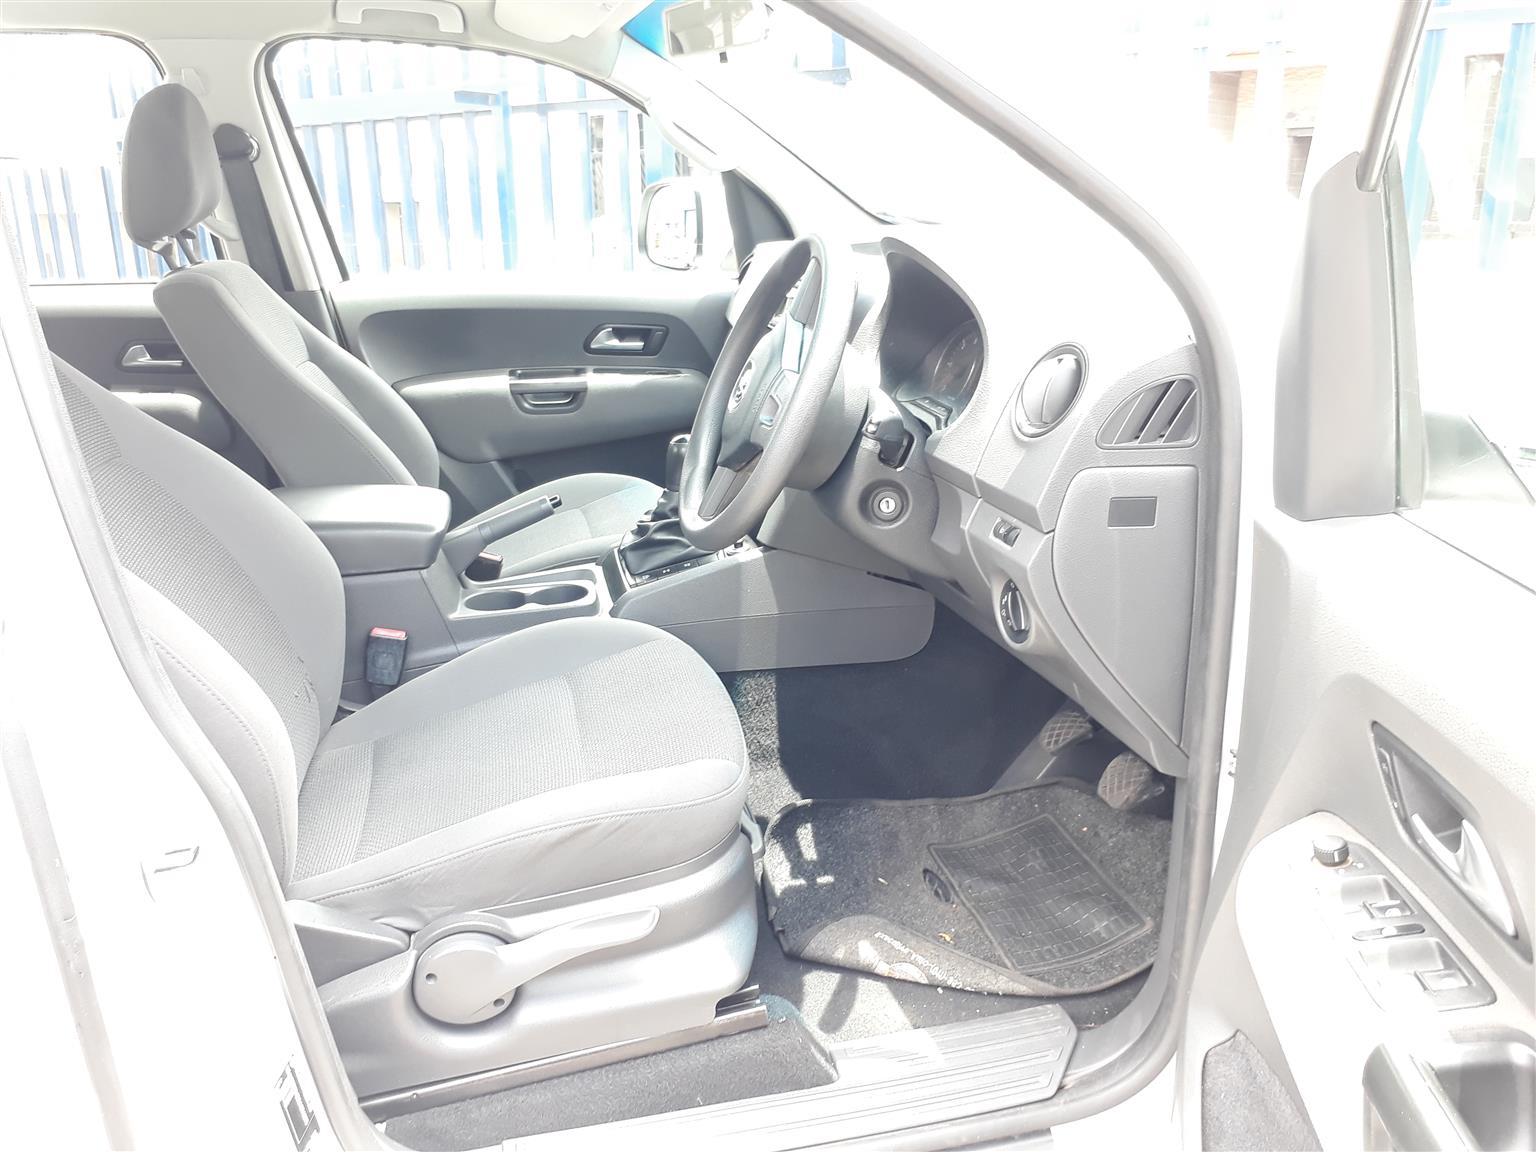 2013 VW Amarok 2.0TDI double cab Comfortline